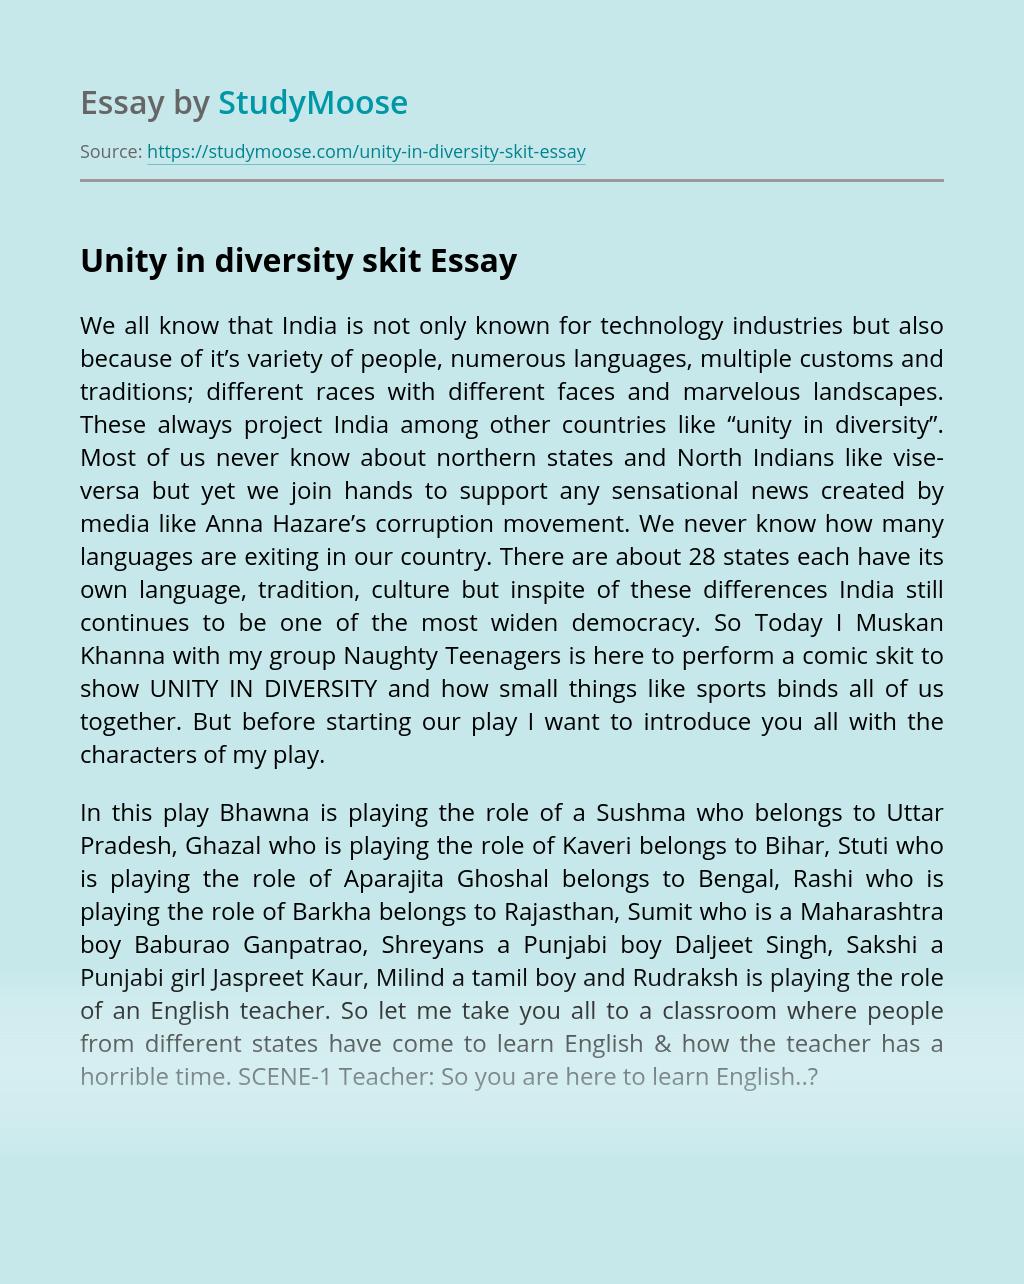 Unity in diversity skit